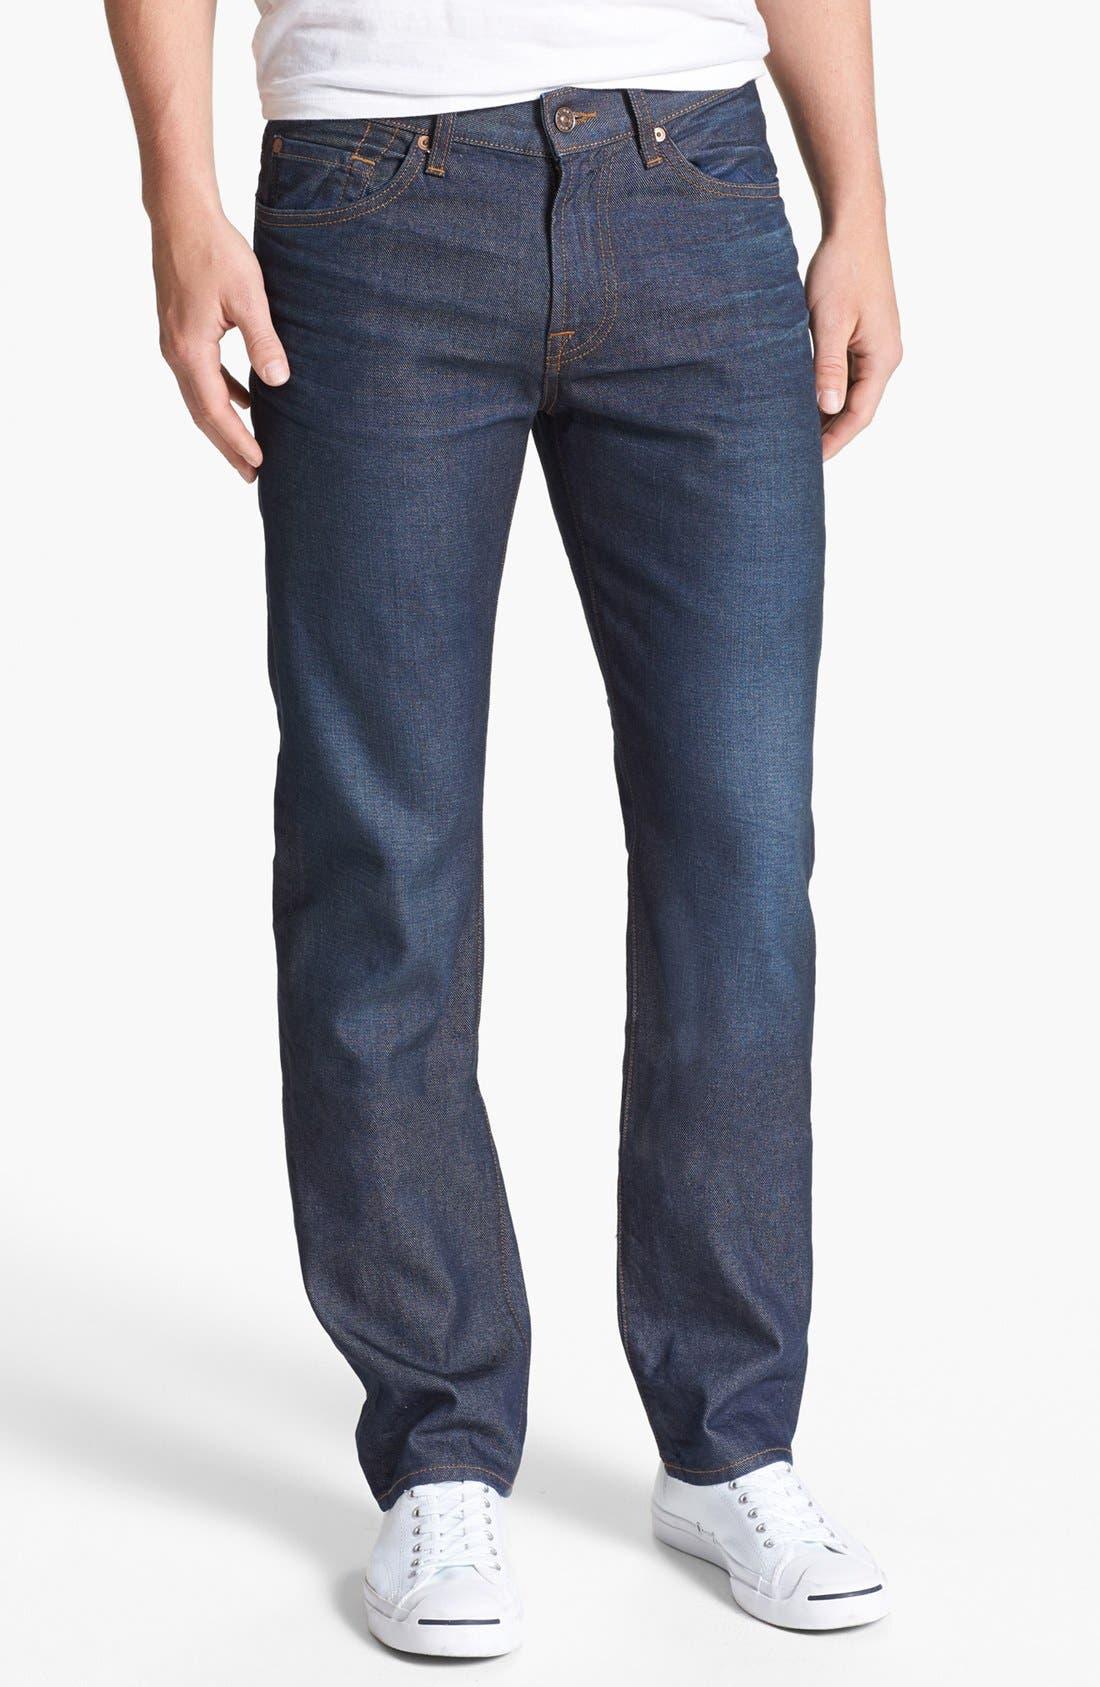 Alternate Image 2  - 7 For All Mankind® 'Slimmy' Slim Fit Jeans (Copper River)